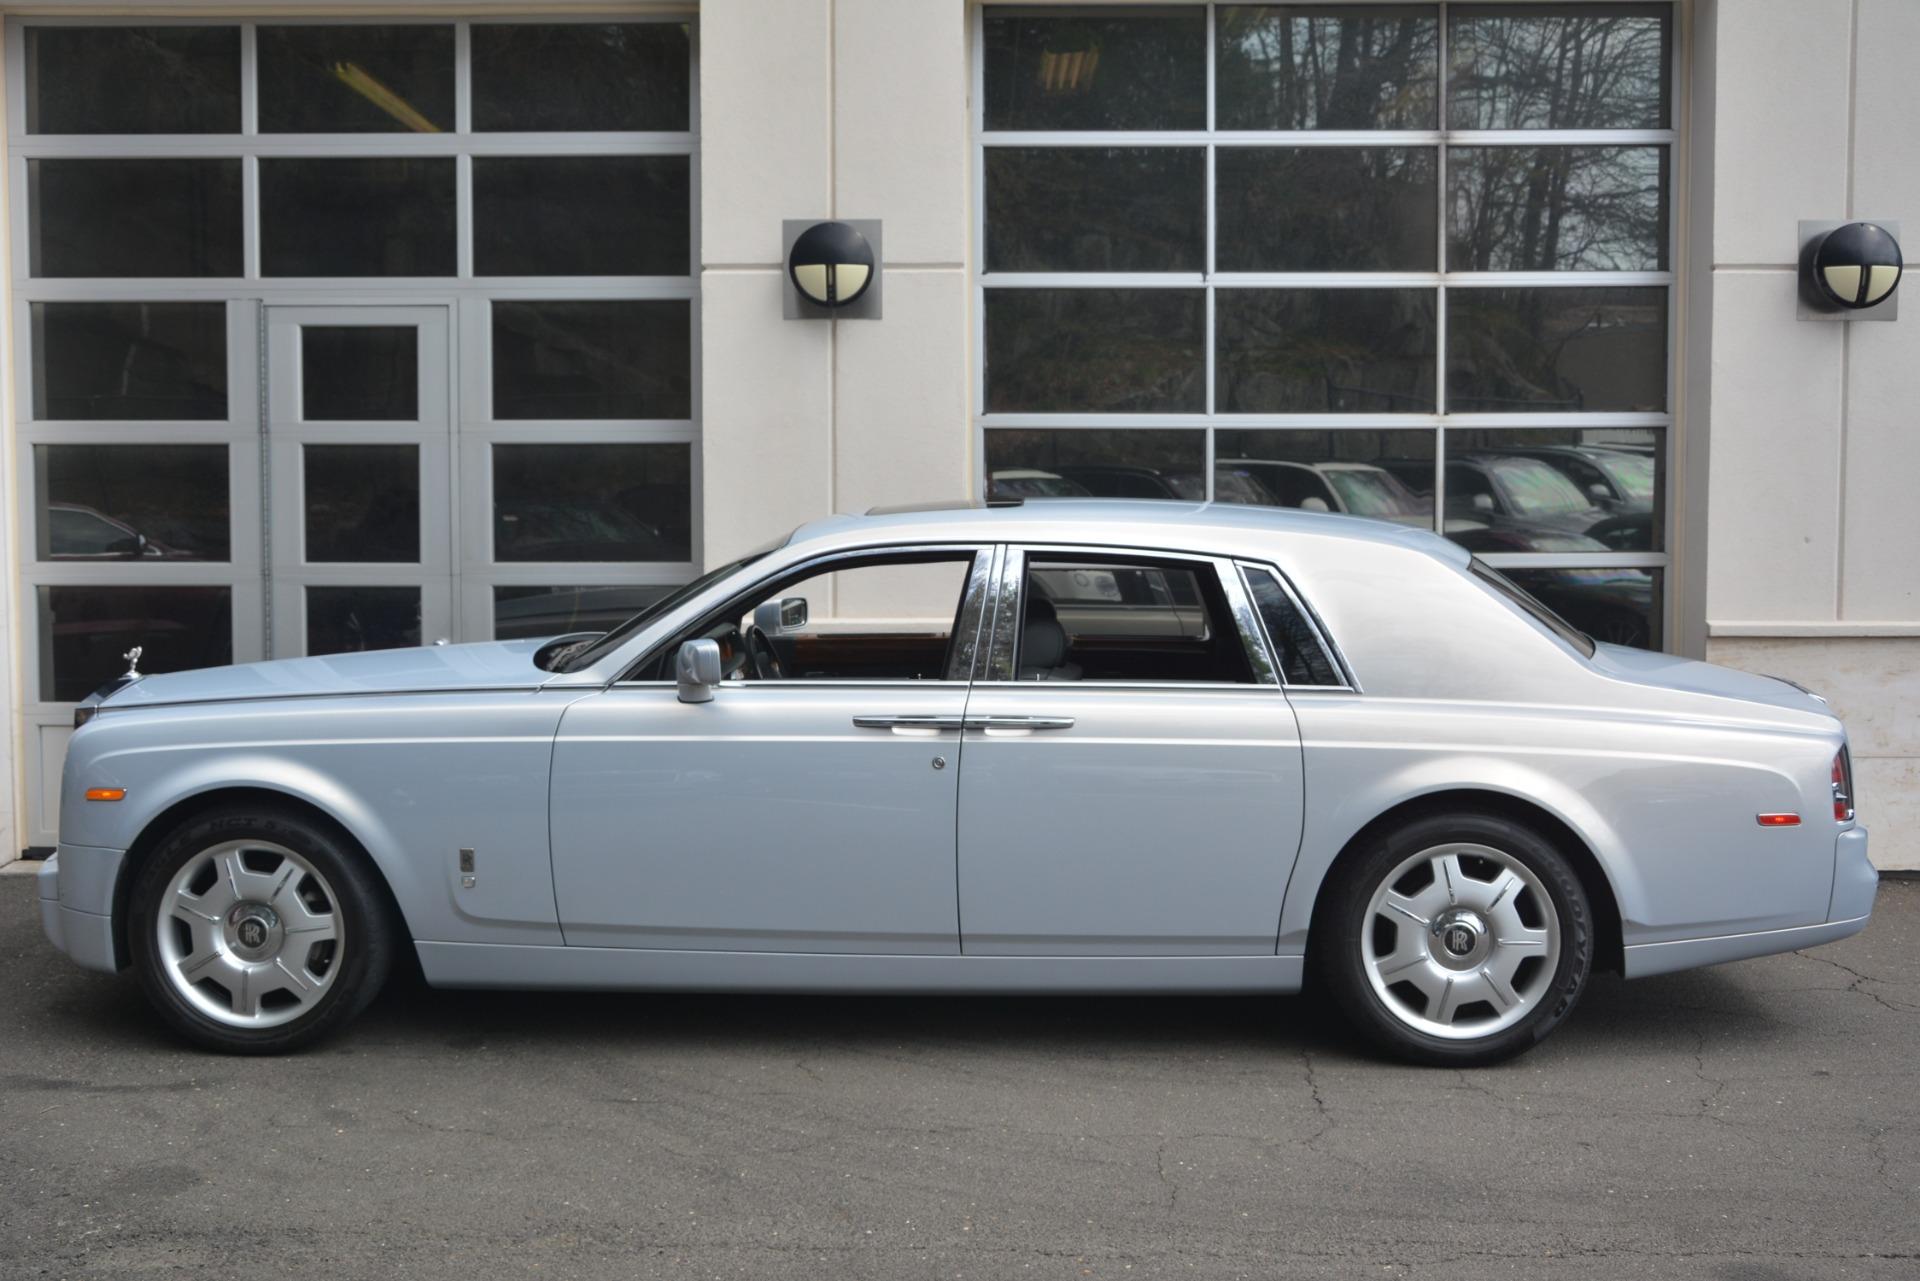 Used 2007 Rolls-Royce Phantom  For Sale In Greenwich, CT 3089_p7